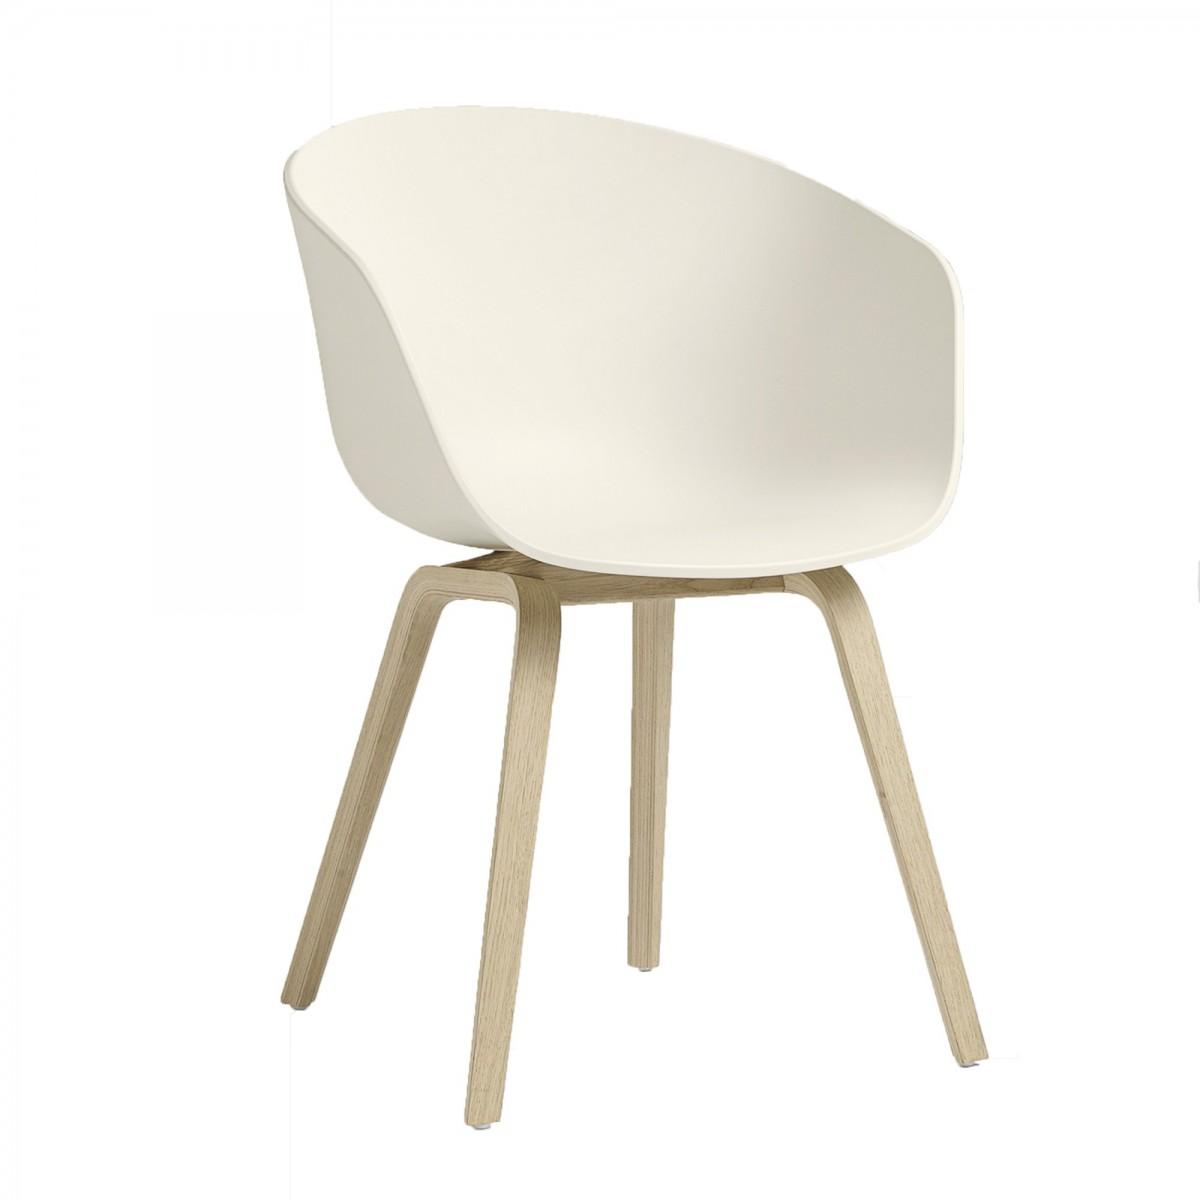 chaise aac 22 cr me en ch ne et coque en polypropyl ne hay. Black Bedroom Furniture Sets. Home Design Ideas